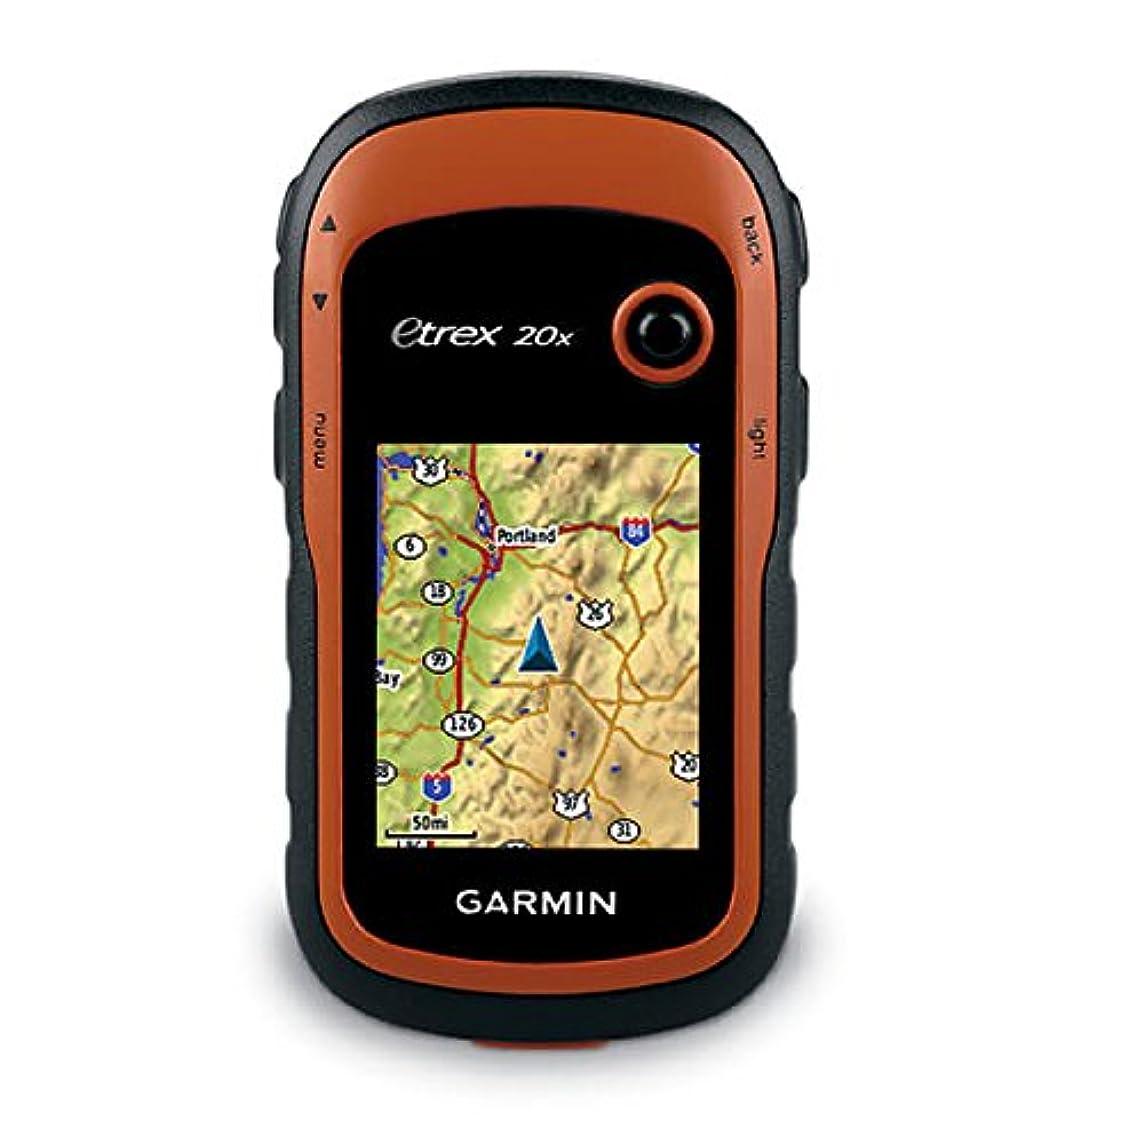 Garmin eTrex 20x, Handheld GPS Navigator, Enhanced Memory and Resolution, 2.2-inch Color Display, Water Resistant